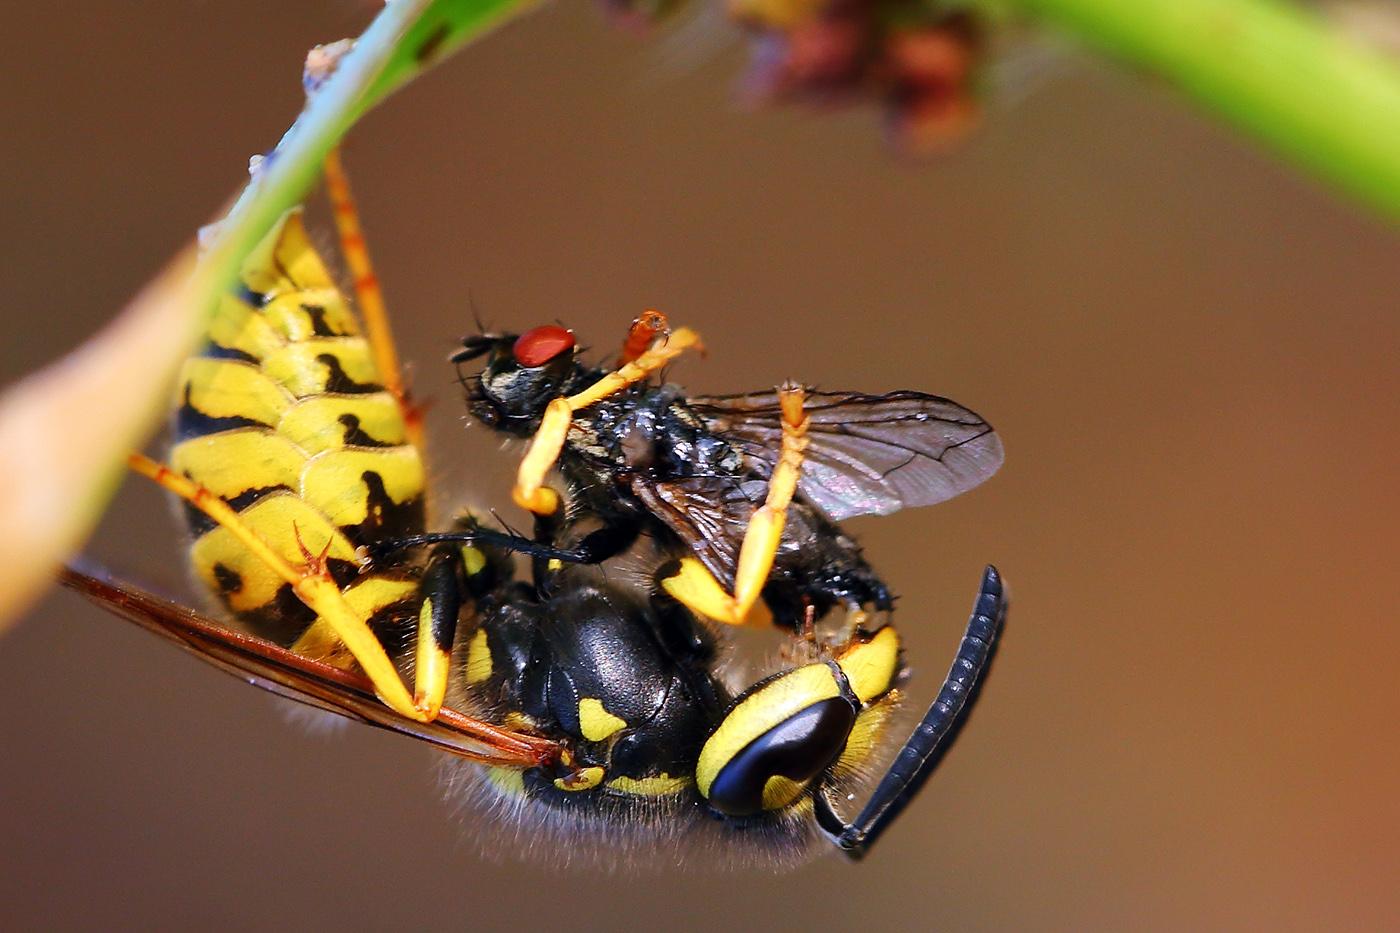 wangsadslr作品:黄蜂猎杀